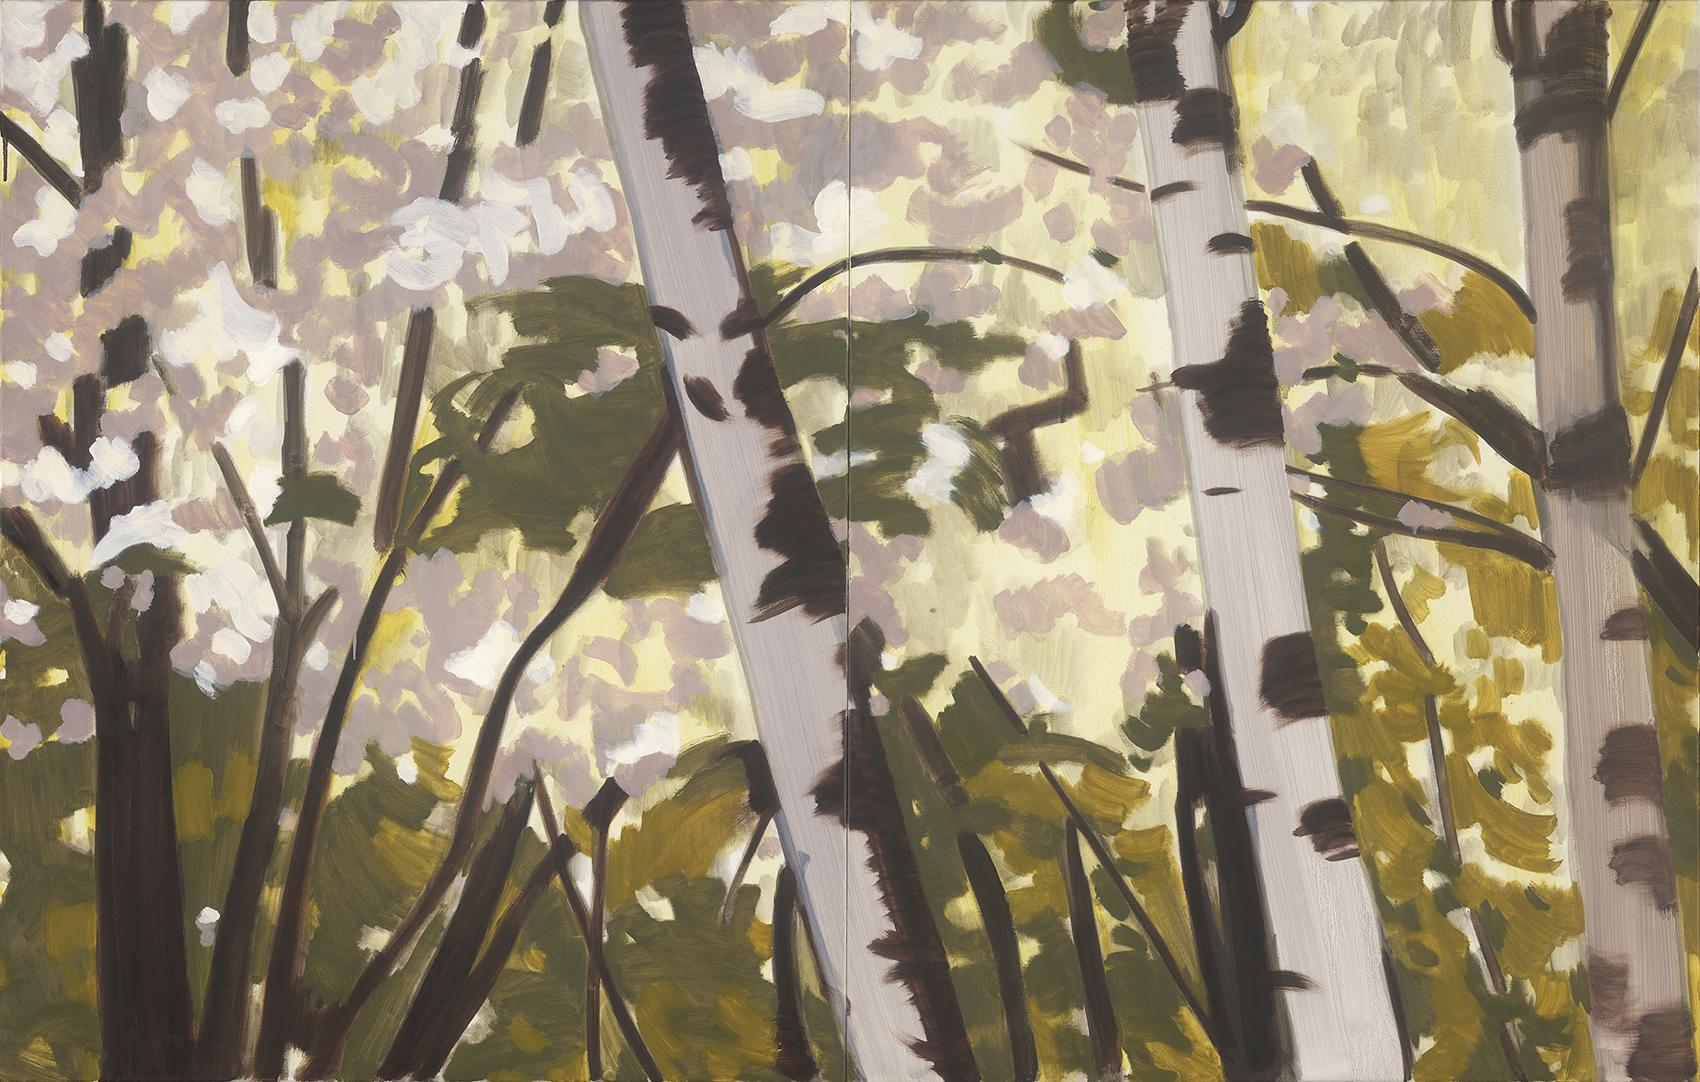 Birch Blossom Forest,(Diptych)oil on linen, 107 x 167 cm